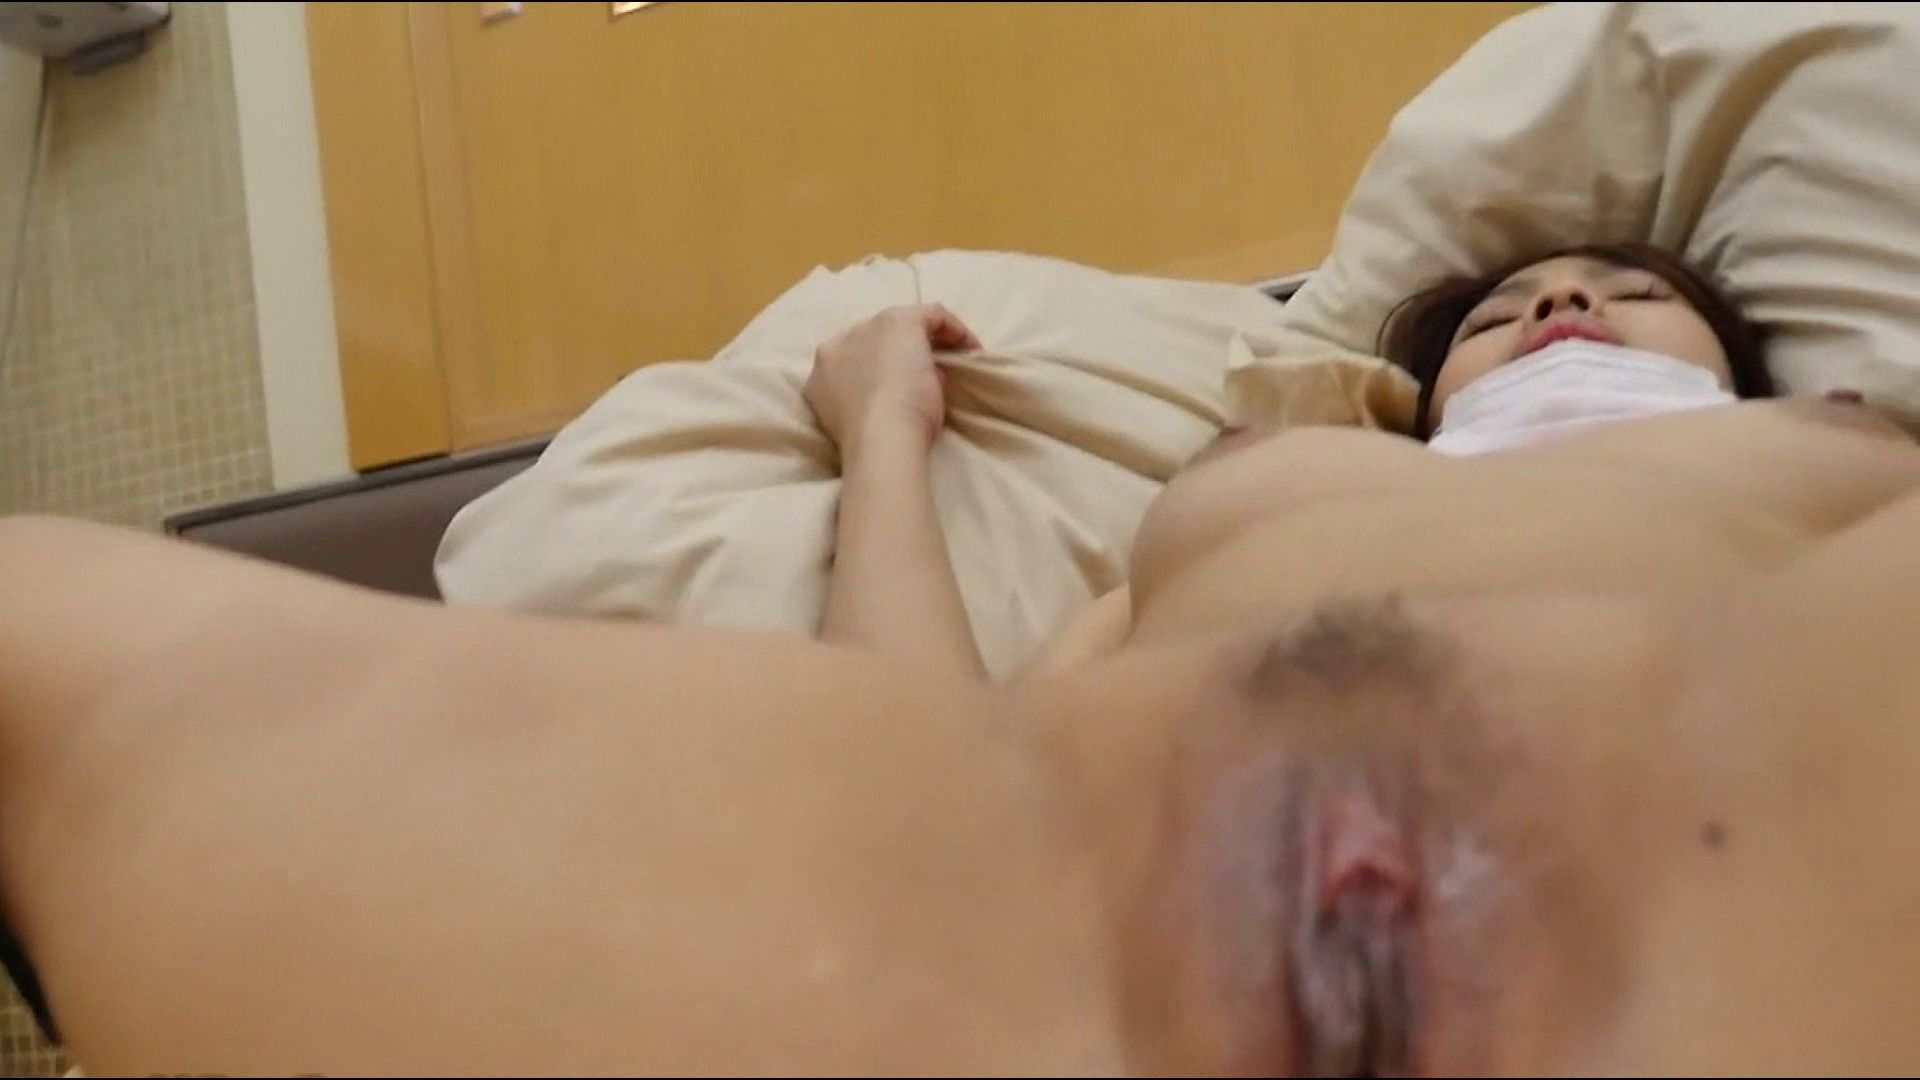 S級厳選美女ビッチガールVol.41 後編 美女のヌード | エッチなセックス  90画像 16